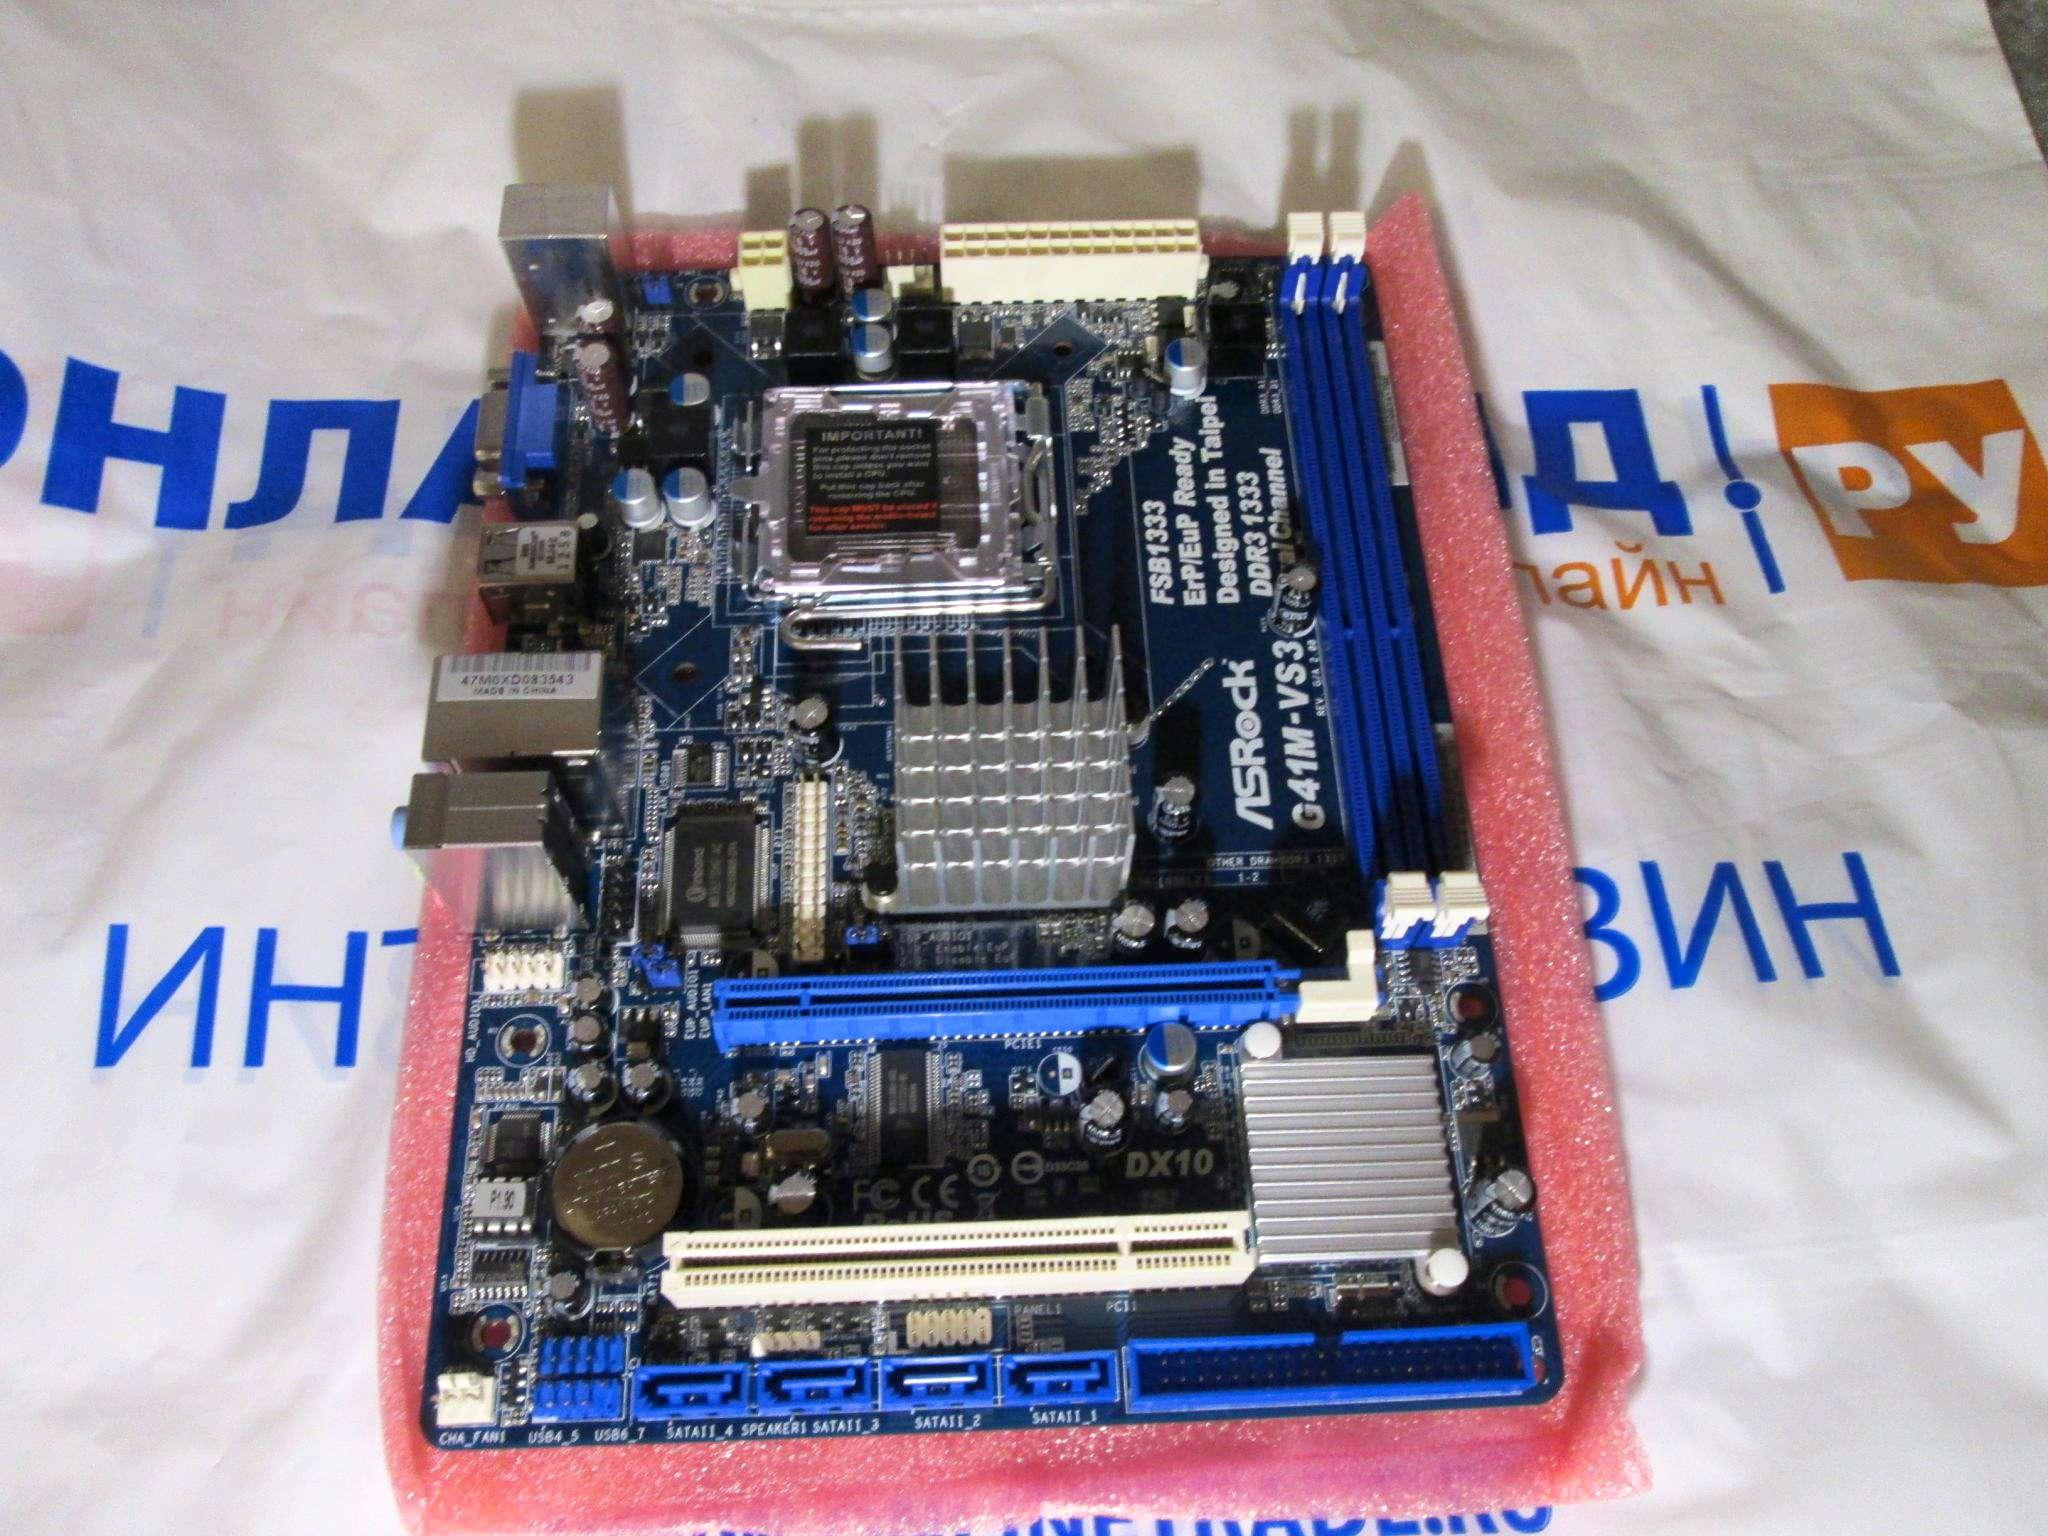 BIOS CHIP ASRock G41M-VS2 G41M-VS3 G41M-VS3 R2.0 For G41 LGA775 Motherboard